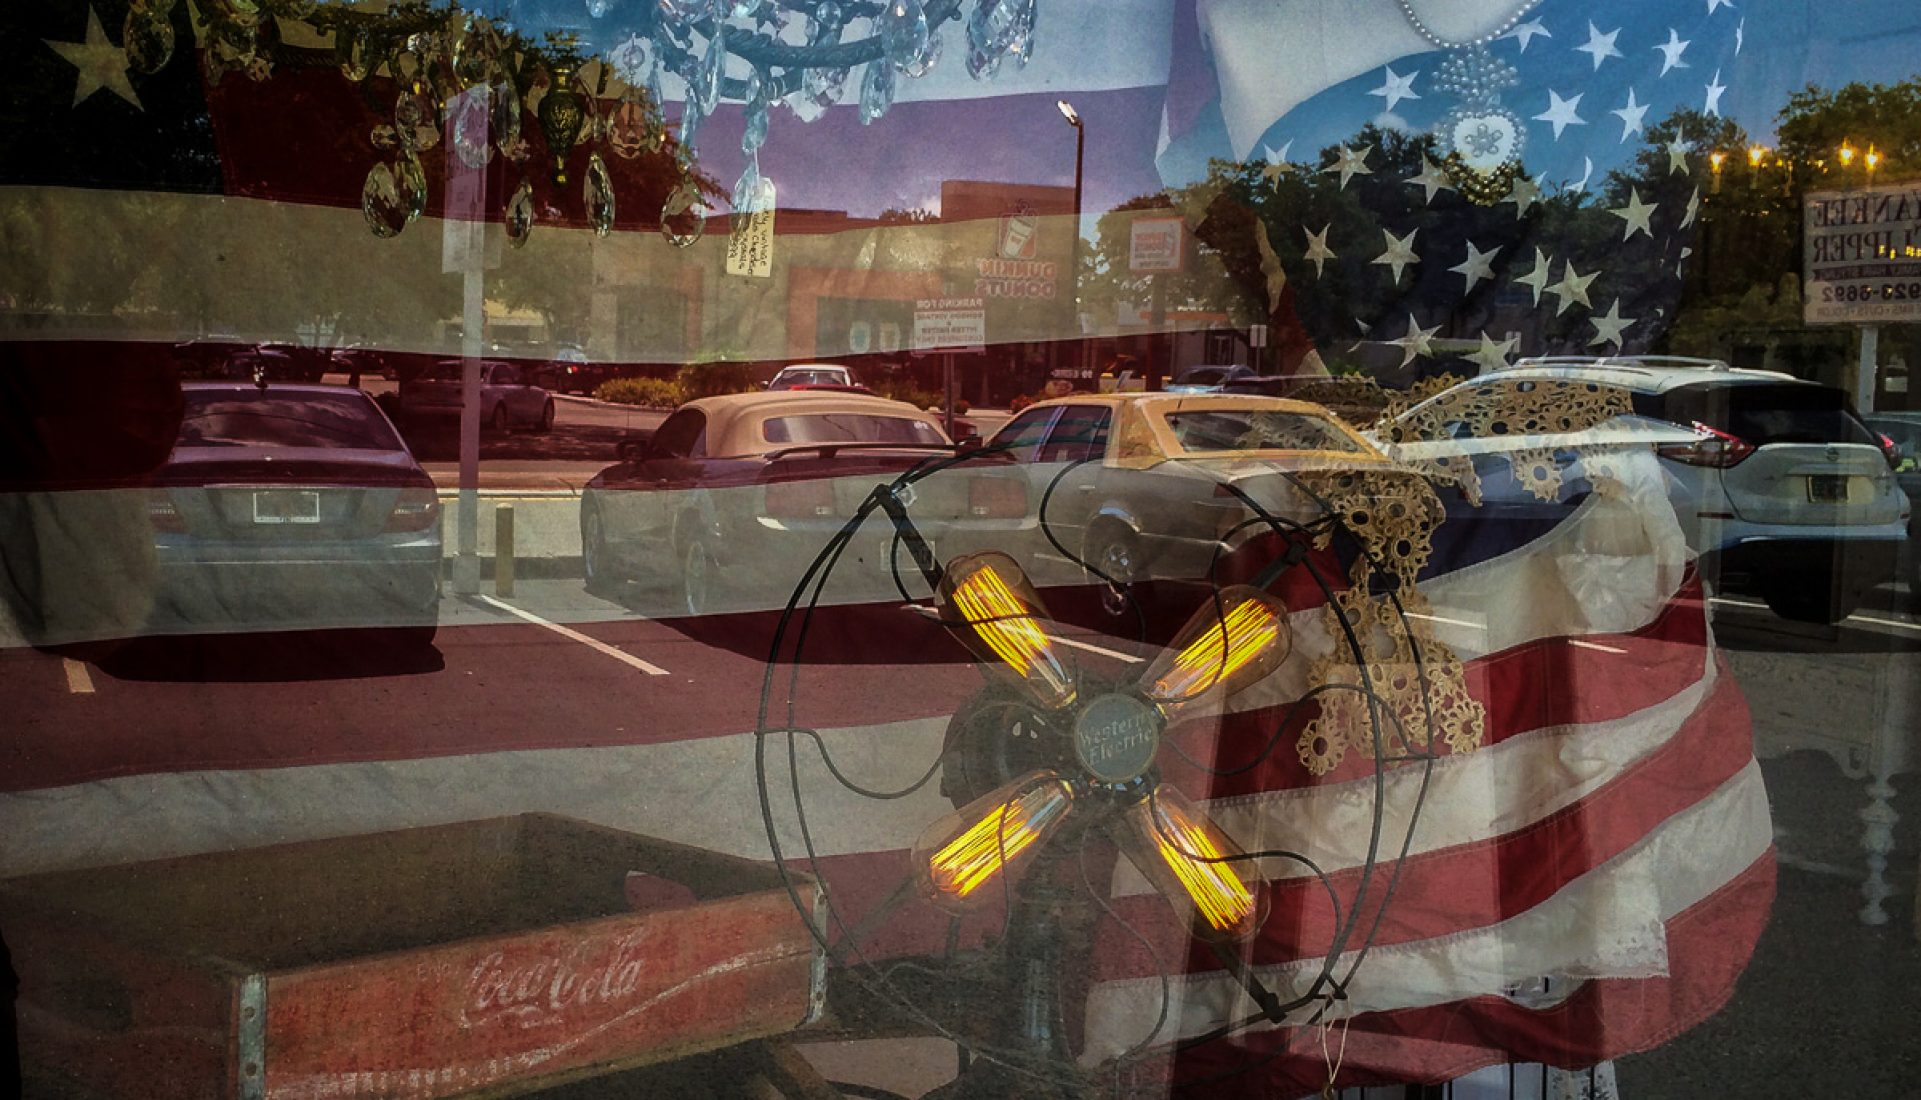 Reflecting on America